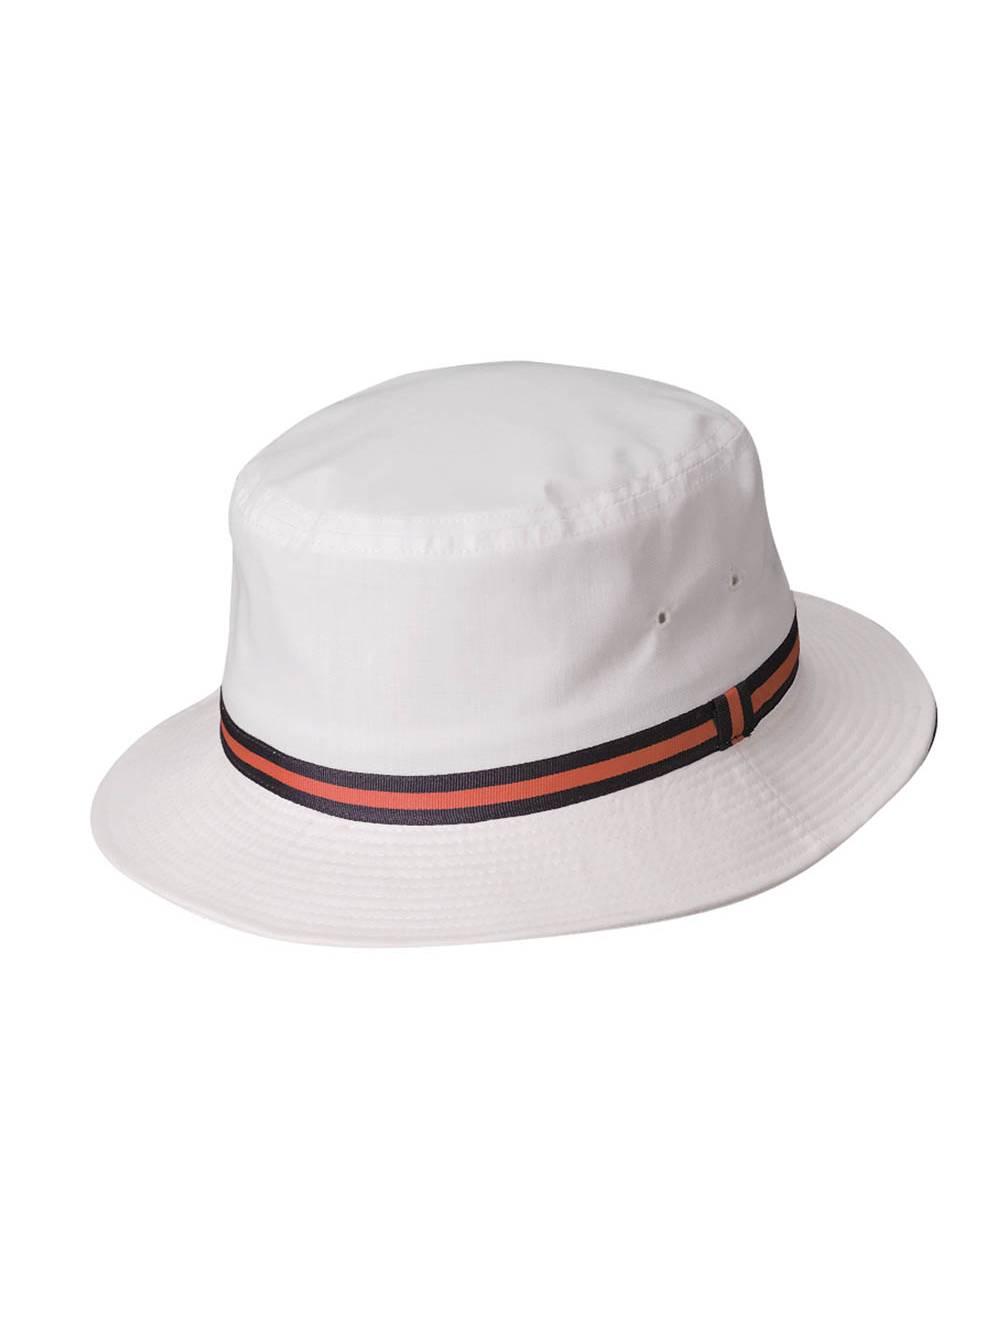 Scala Classico Rain Hat - Bucket Hat by Dorfman Pacific White Small 5ad7bf4a7c6